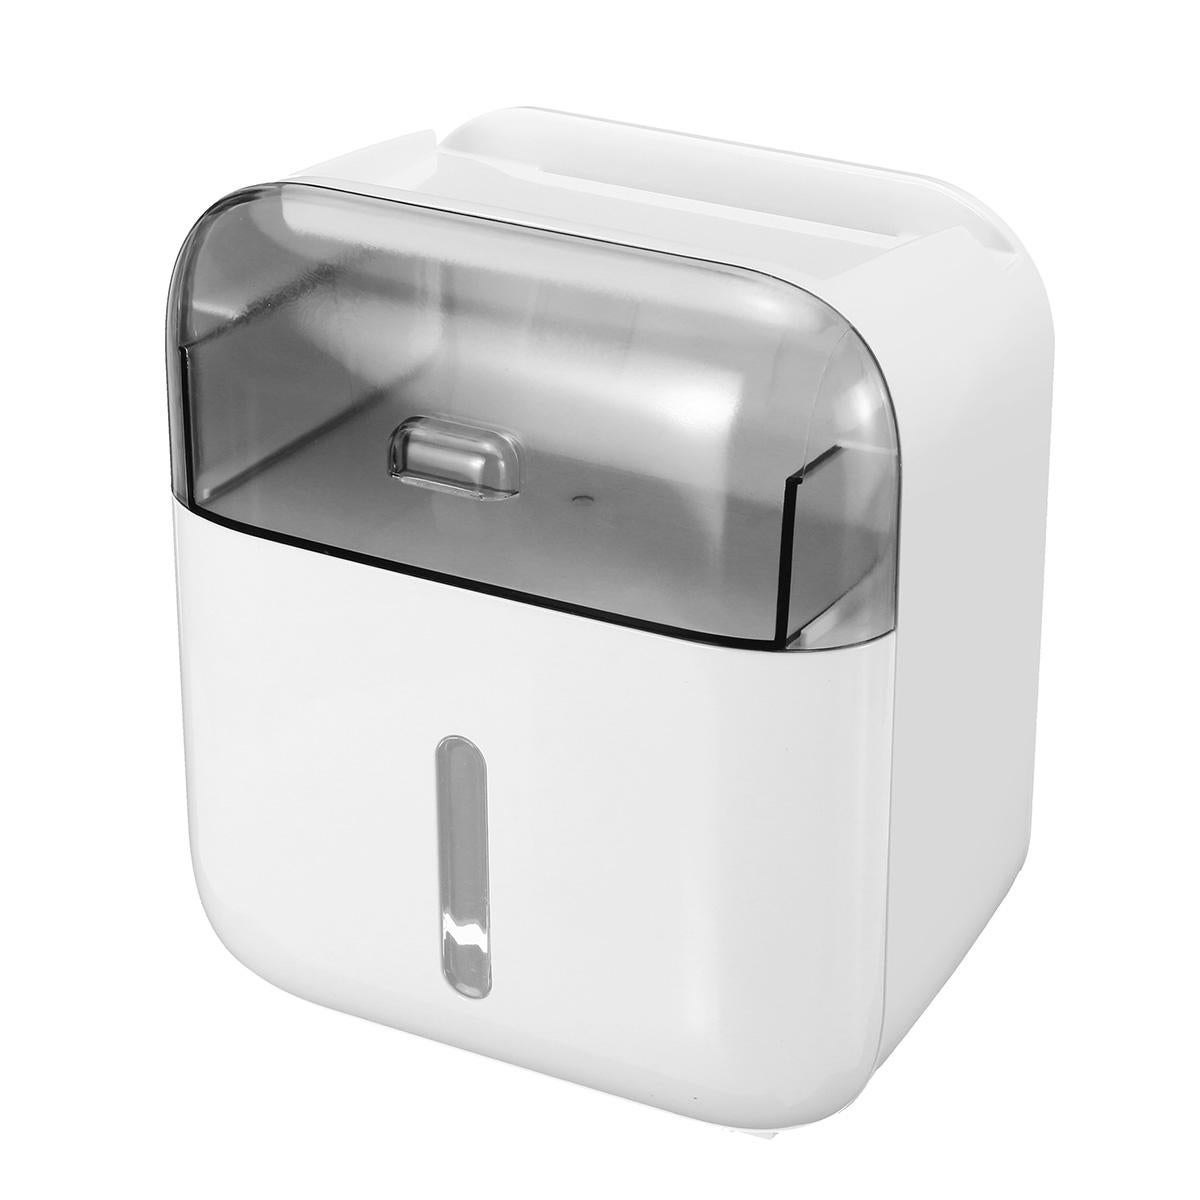 Toilet Paper Waterproof Wall Mount Tissue Double Holder Shelf Tube Storage Box Paper Shelf Holder